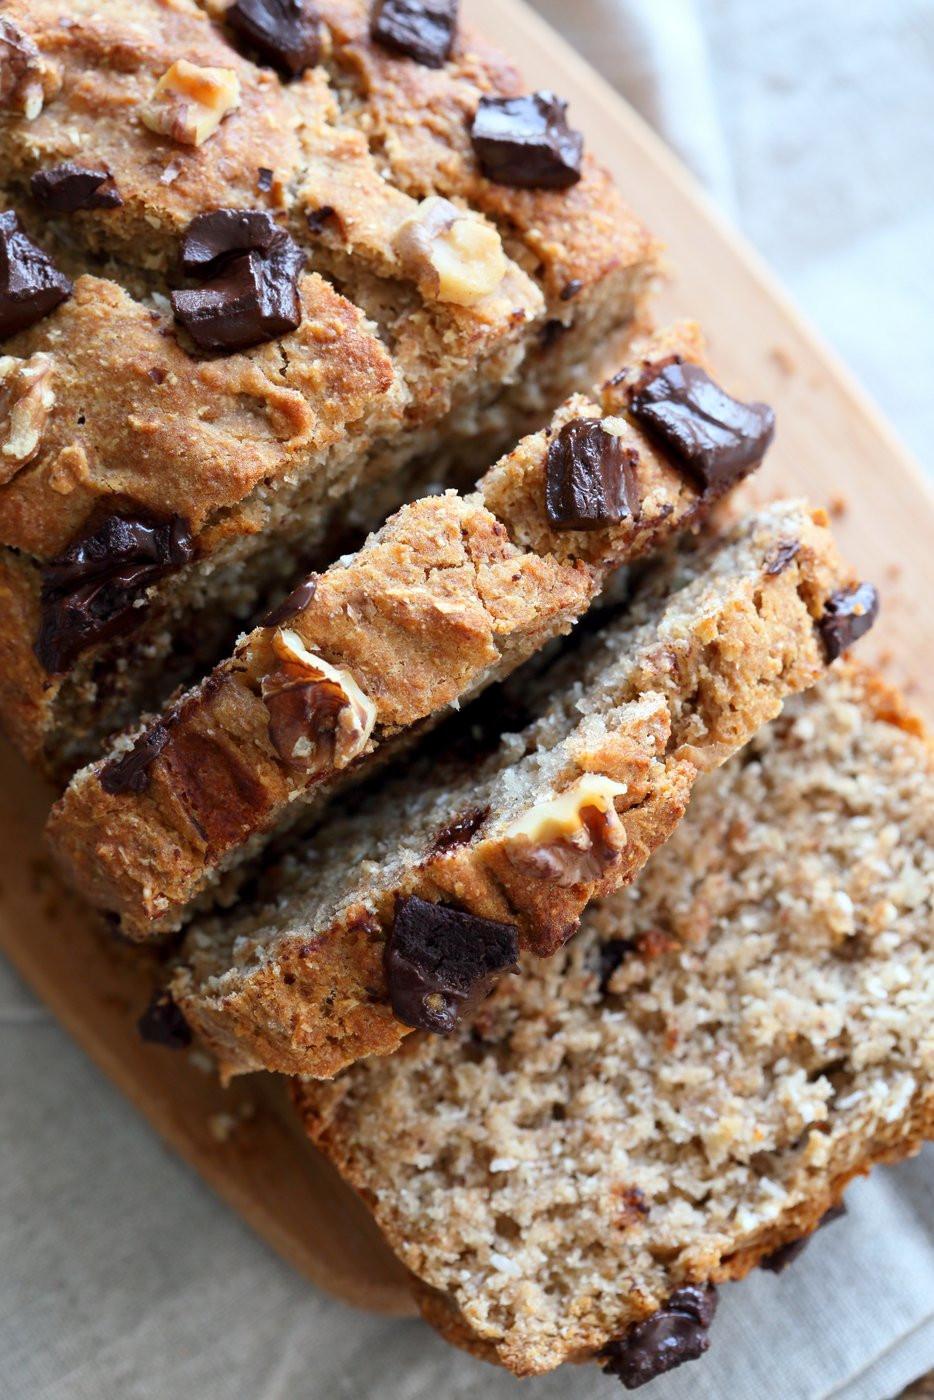 Vegan Banana Recipes  Vegan Banana Orange Nut Loaf Recipe — Dishmaps